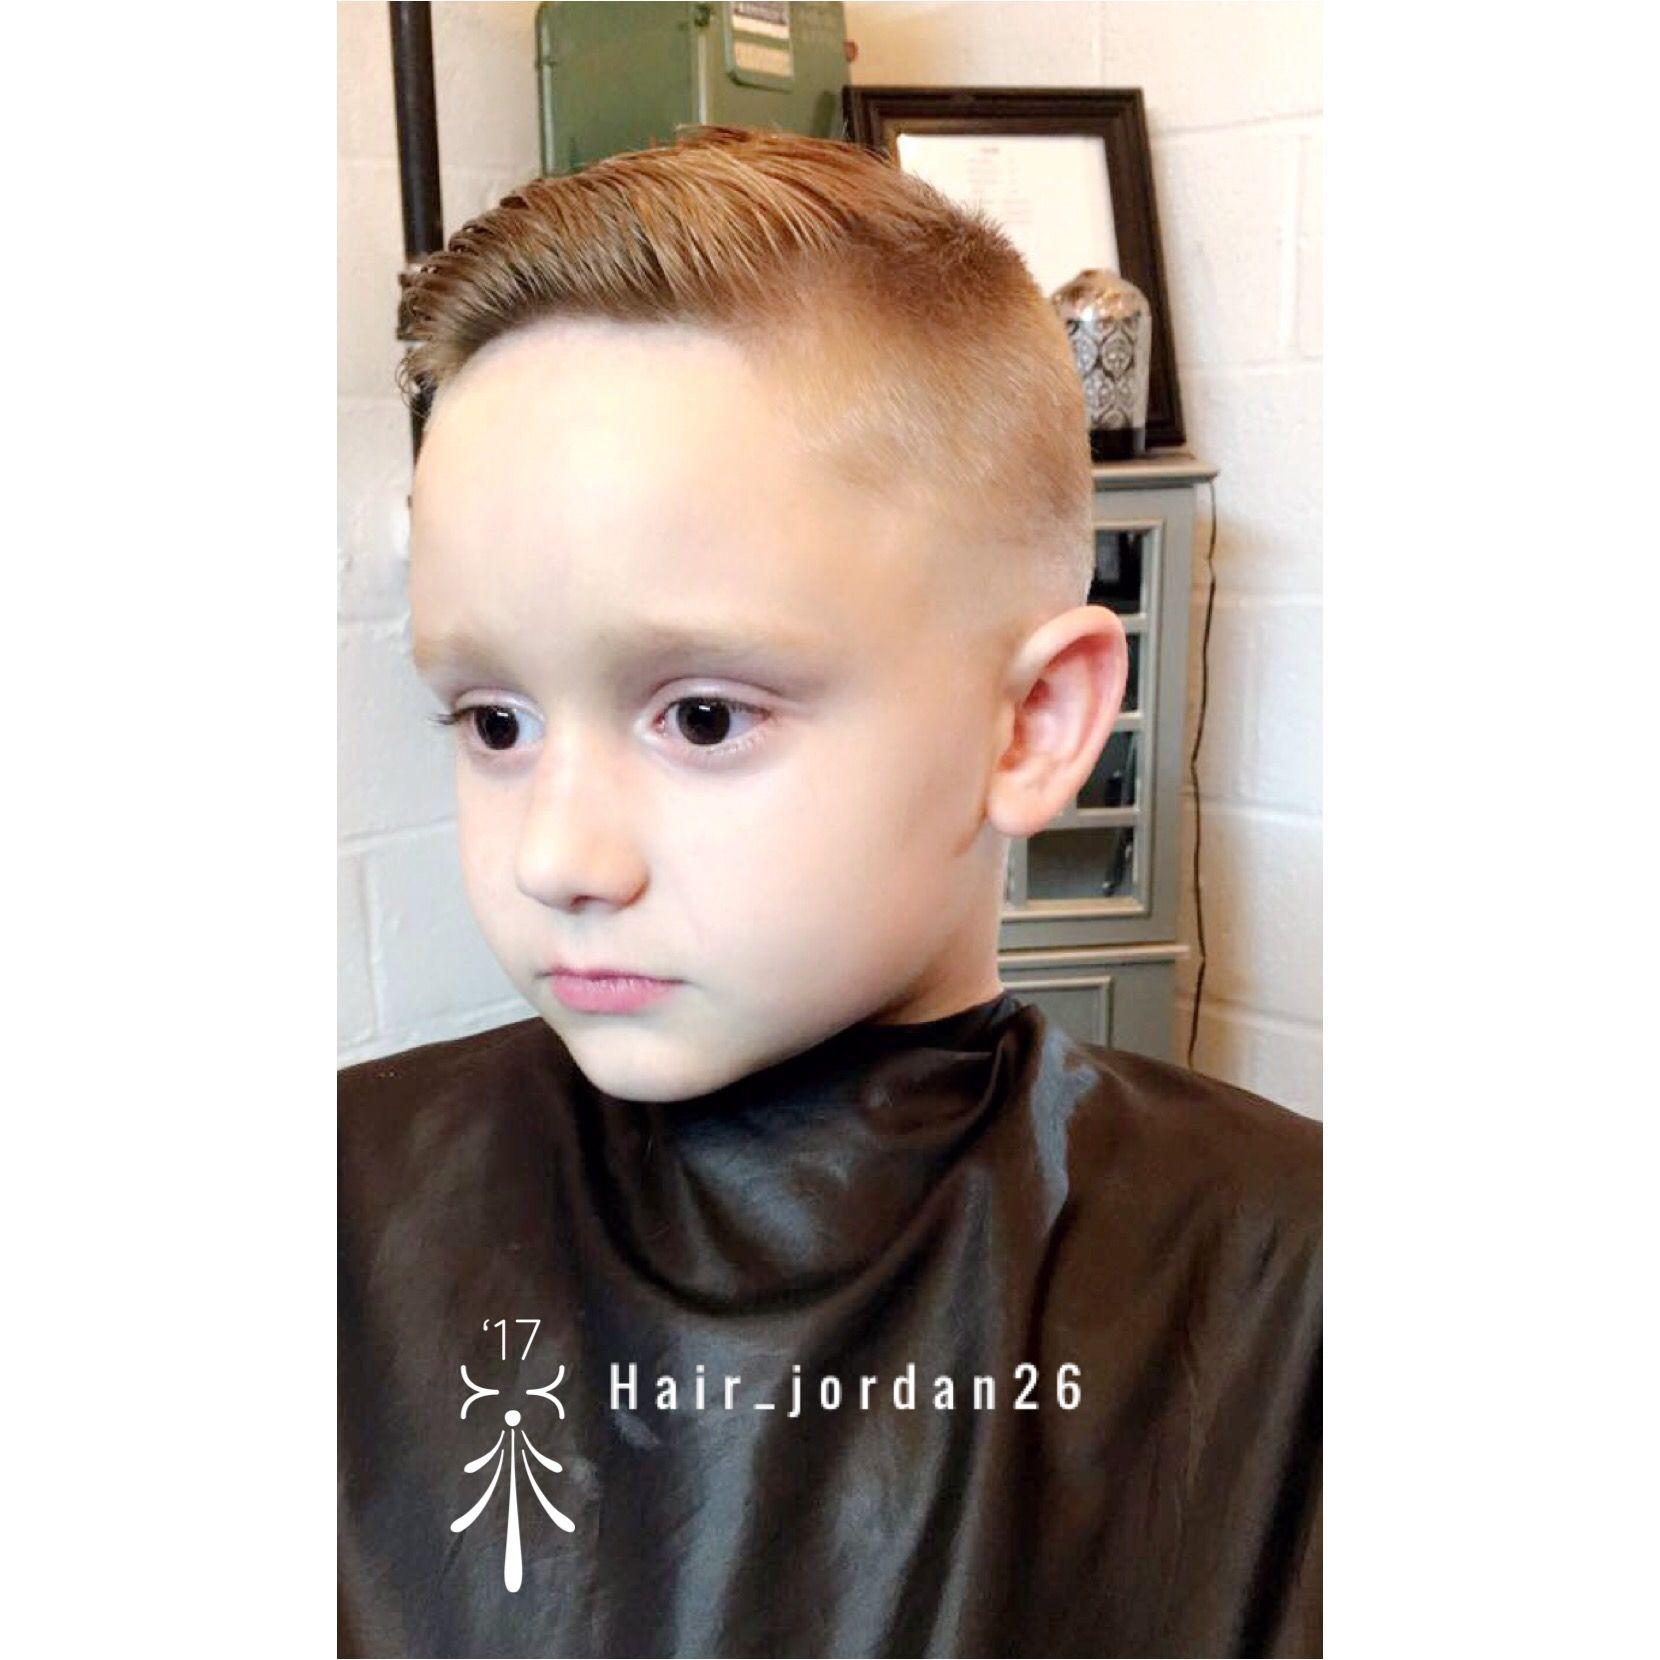 Boy haircuts Hair jordan26 Pinterest